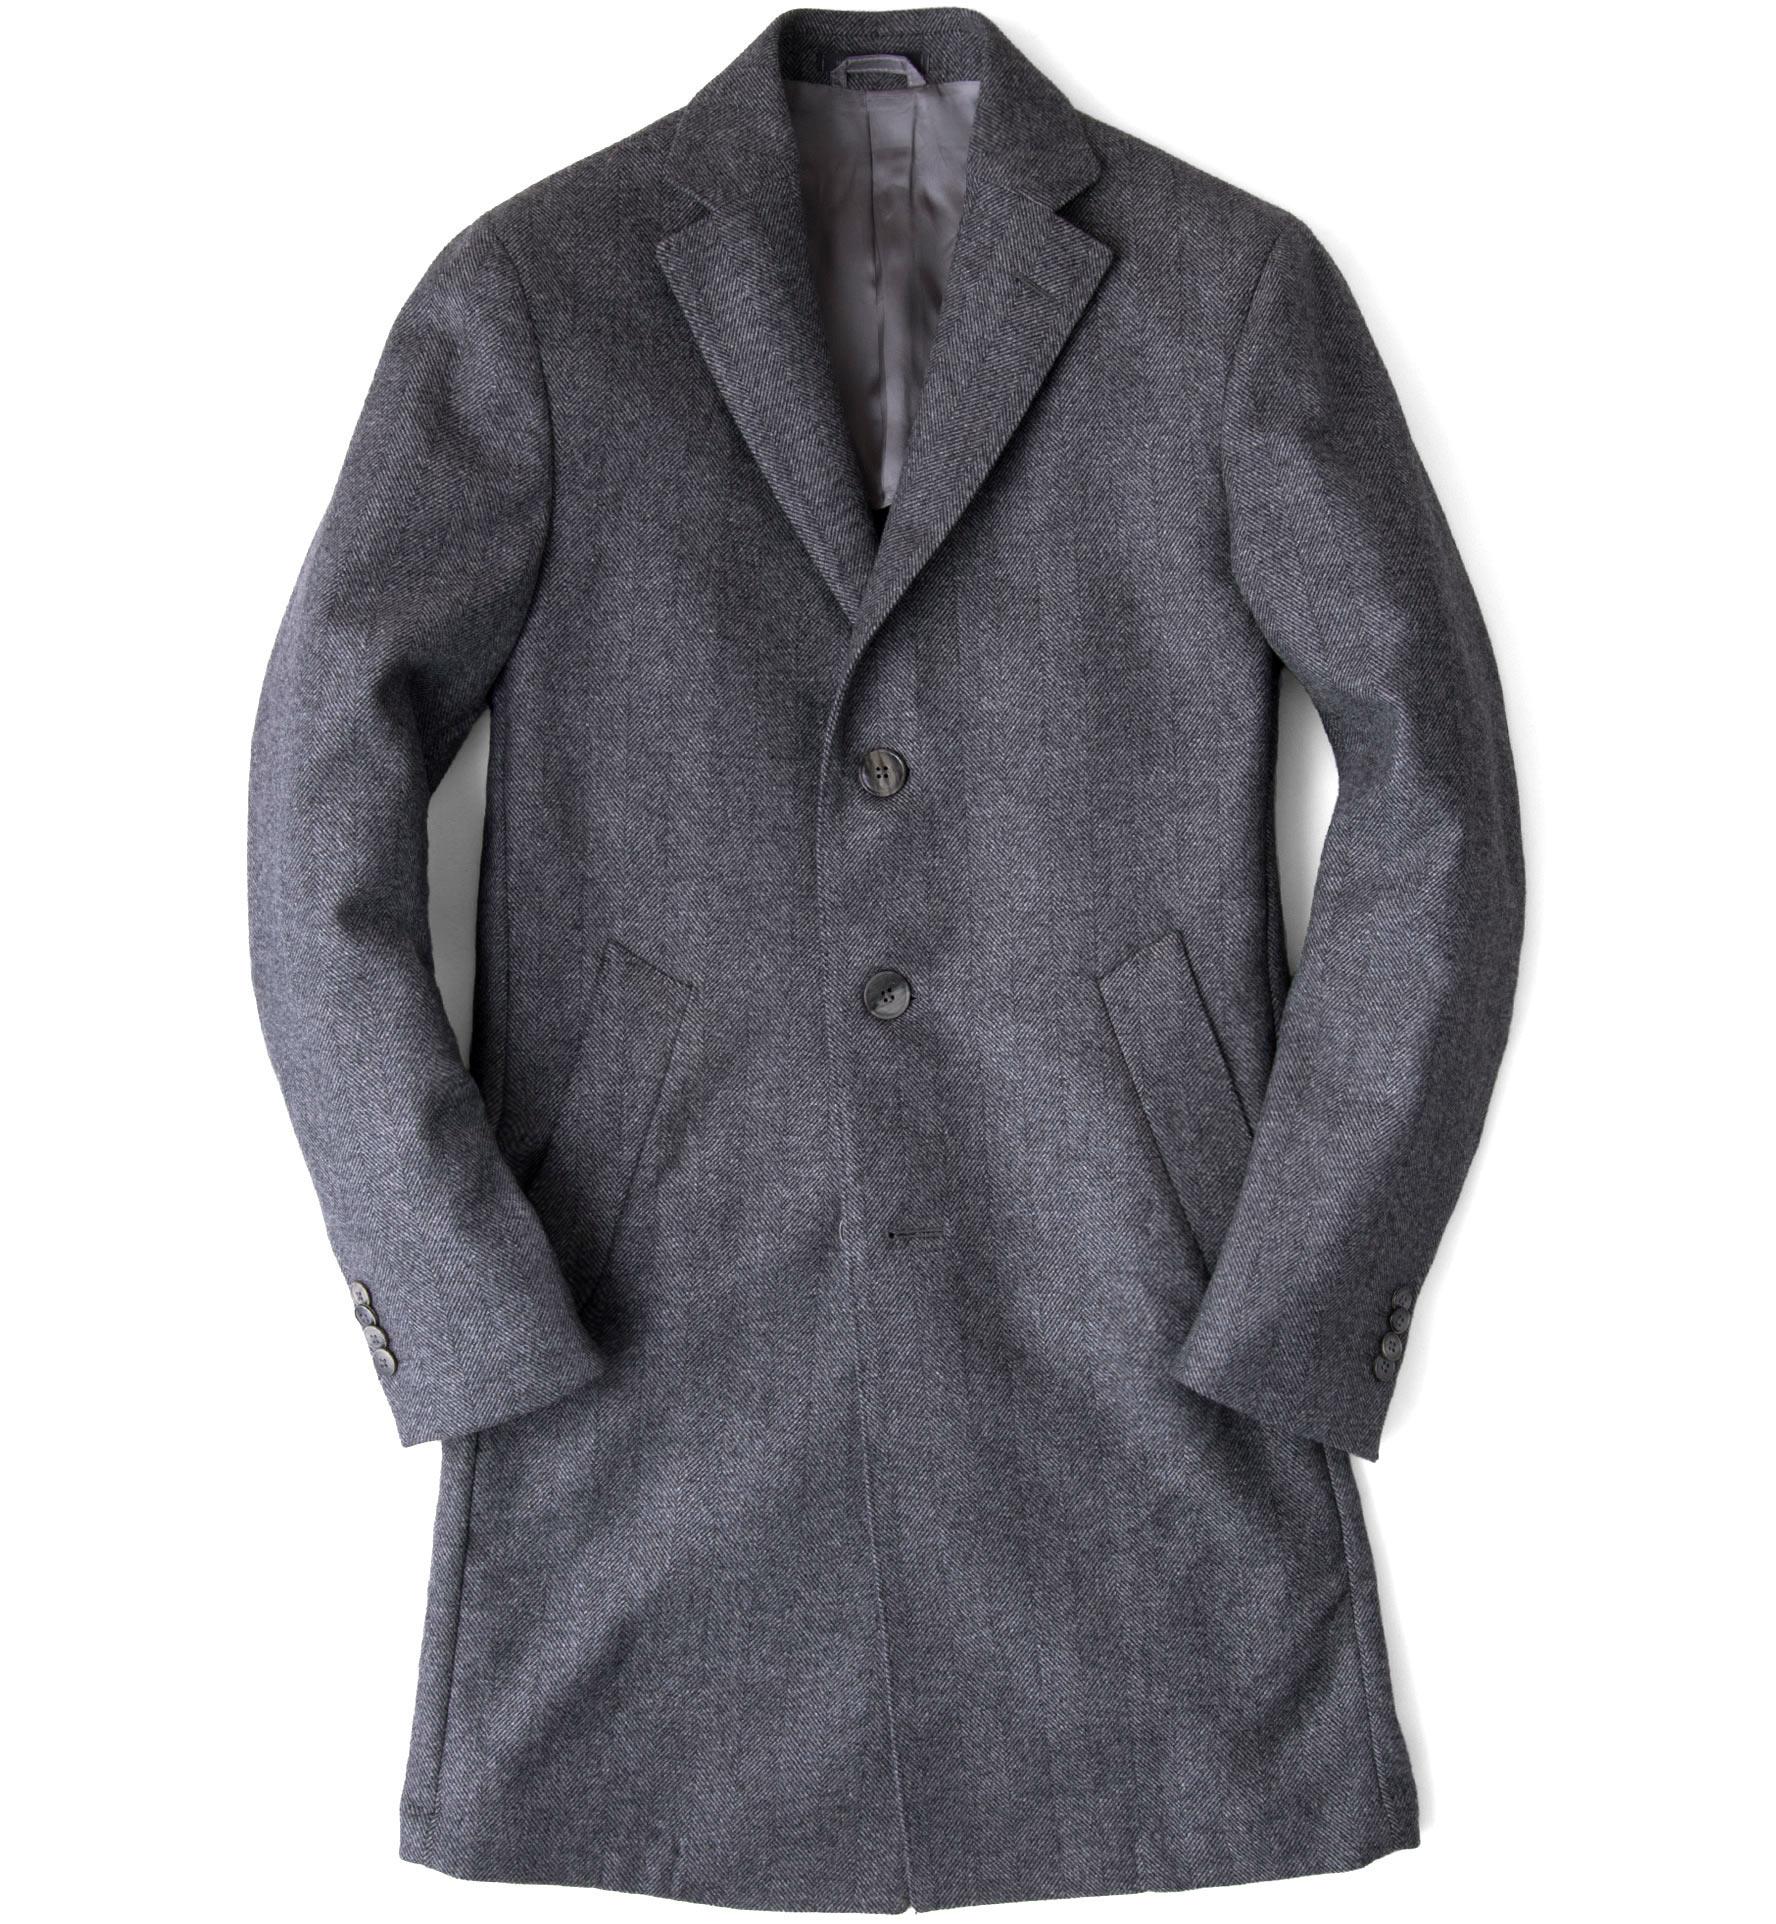 Zoom Image of Brera Grey Herringbone Wool Overcoat